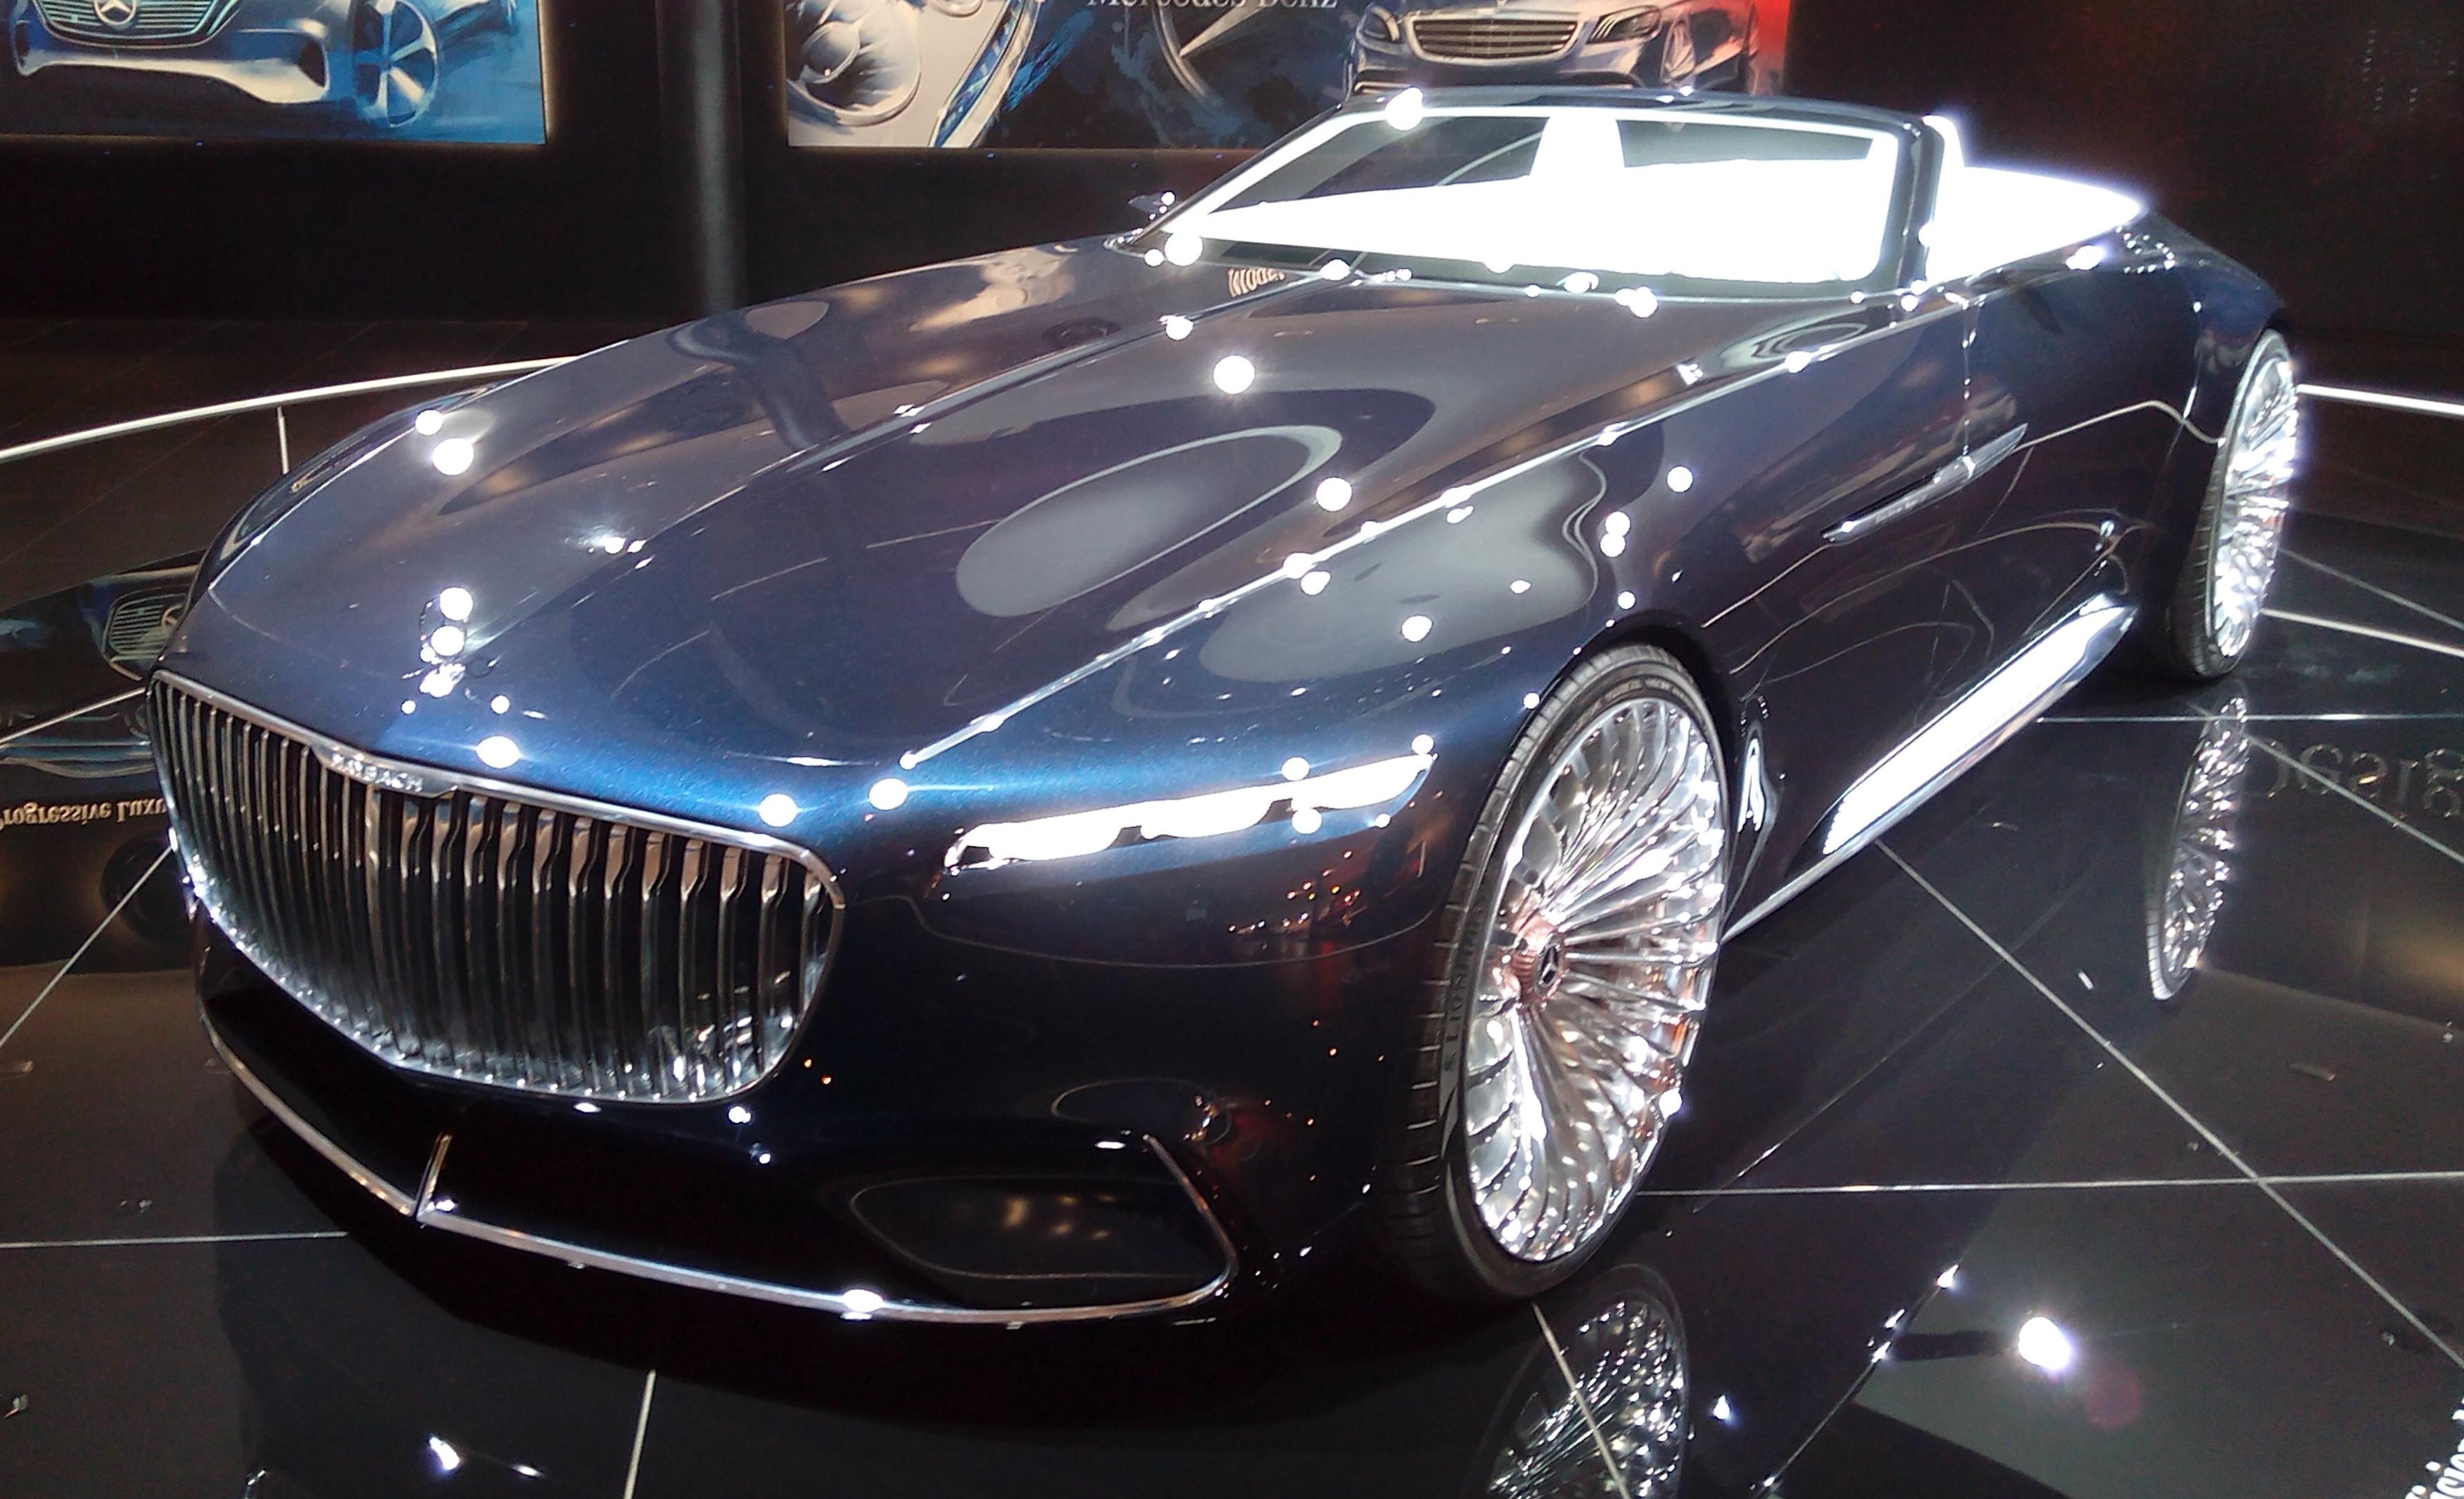 datei:vision mercedesmaybach 6 convertible – wikipedia